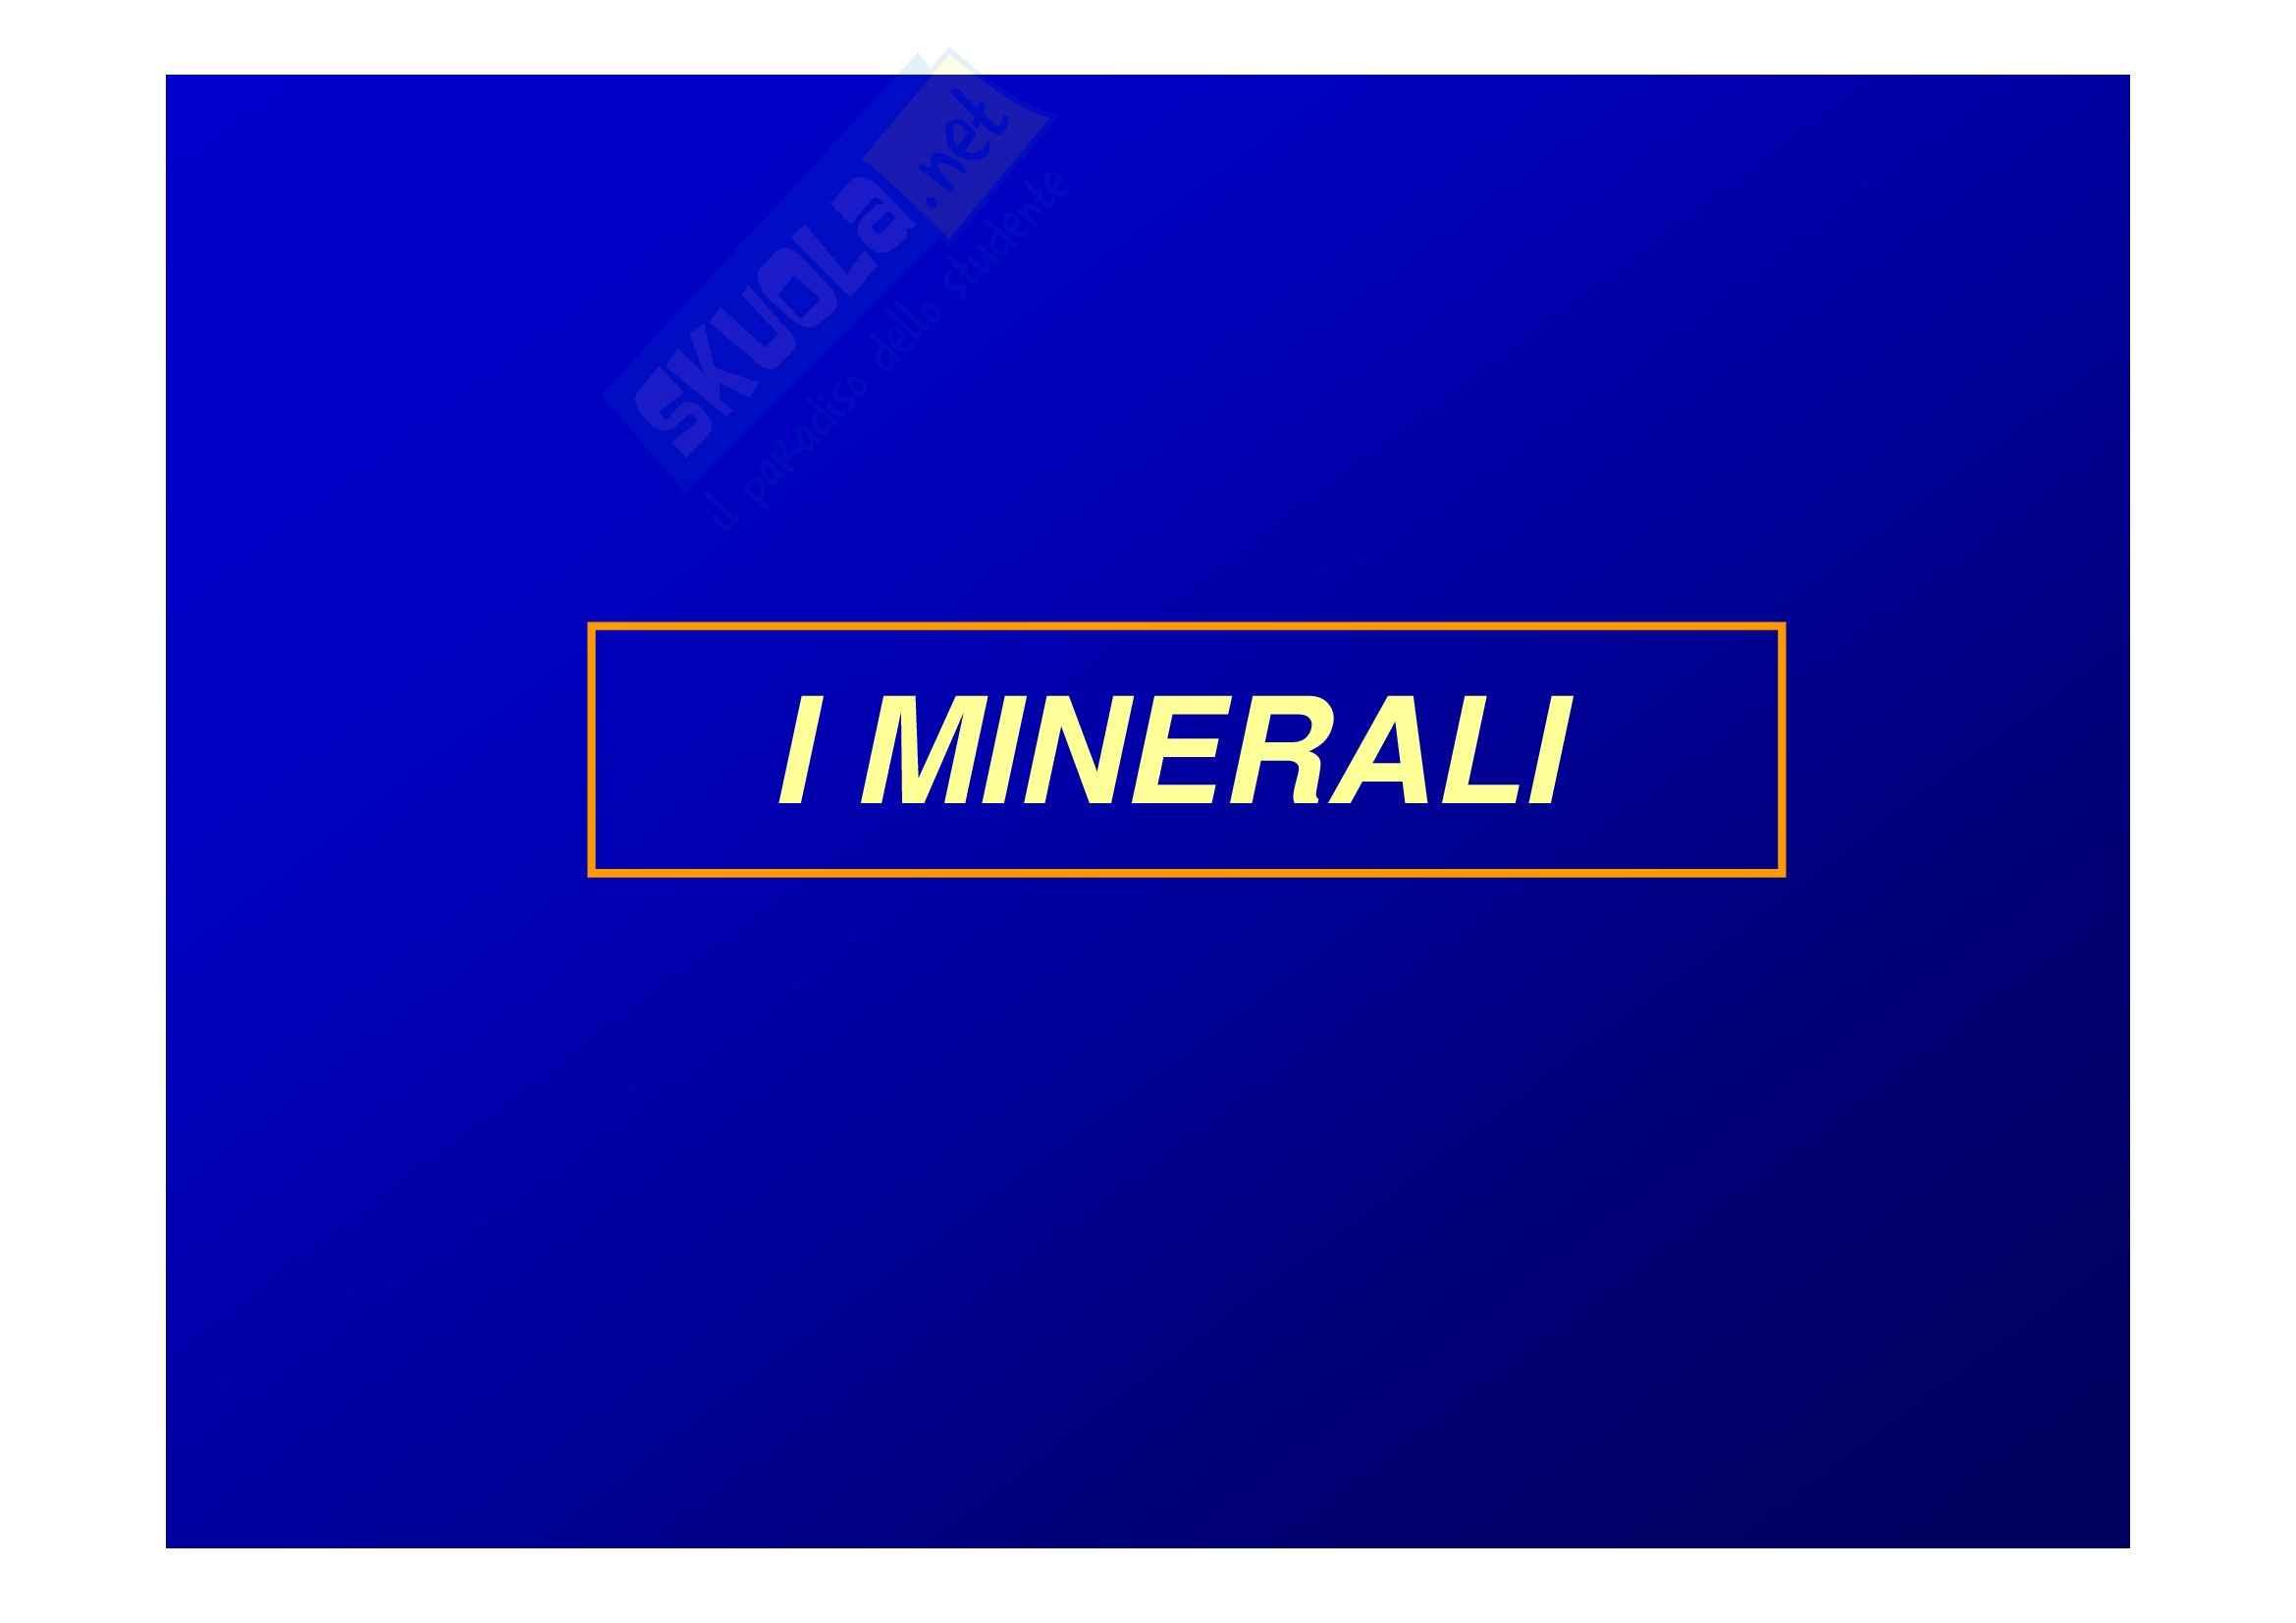 Geologia applicata - minerali